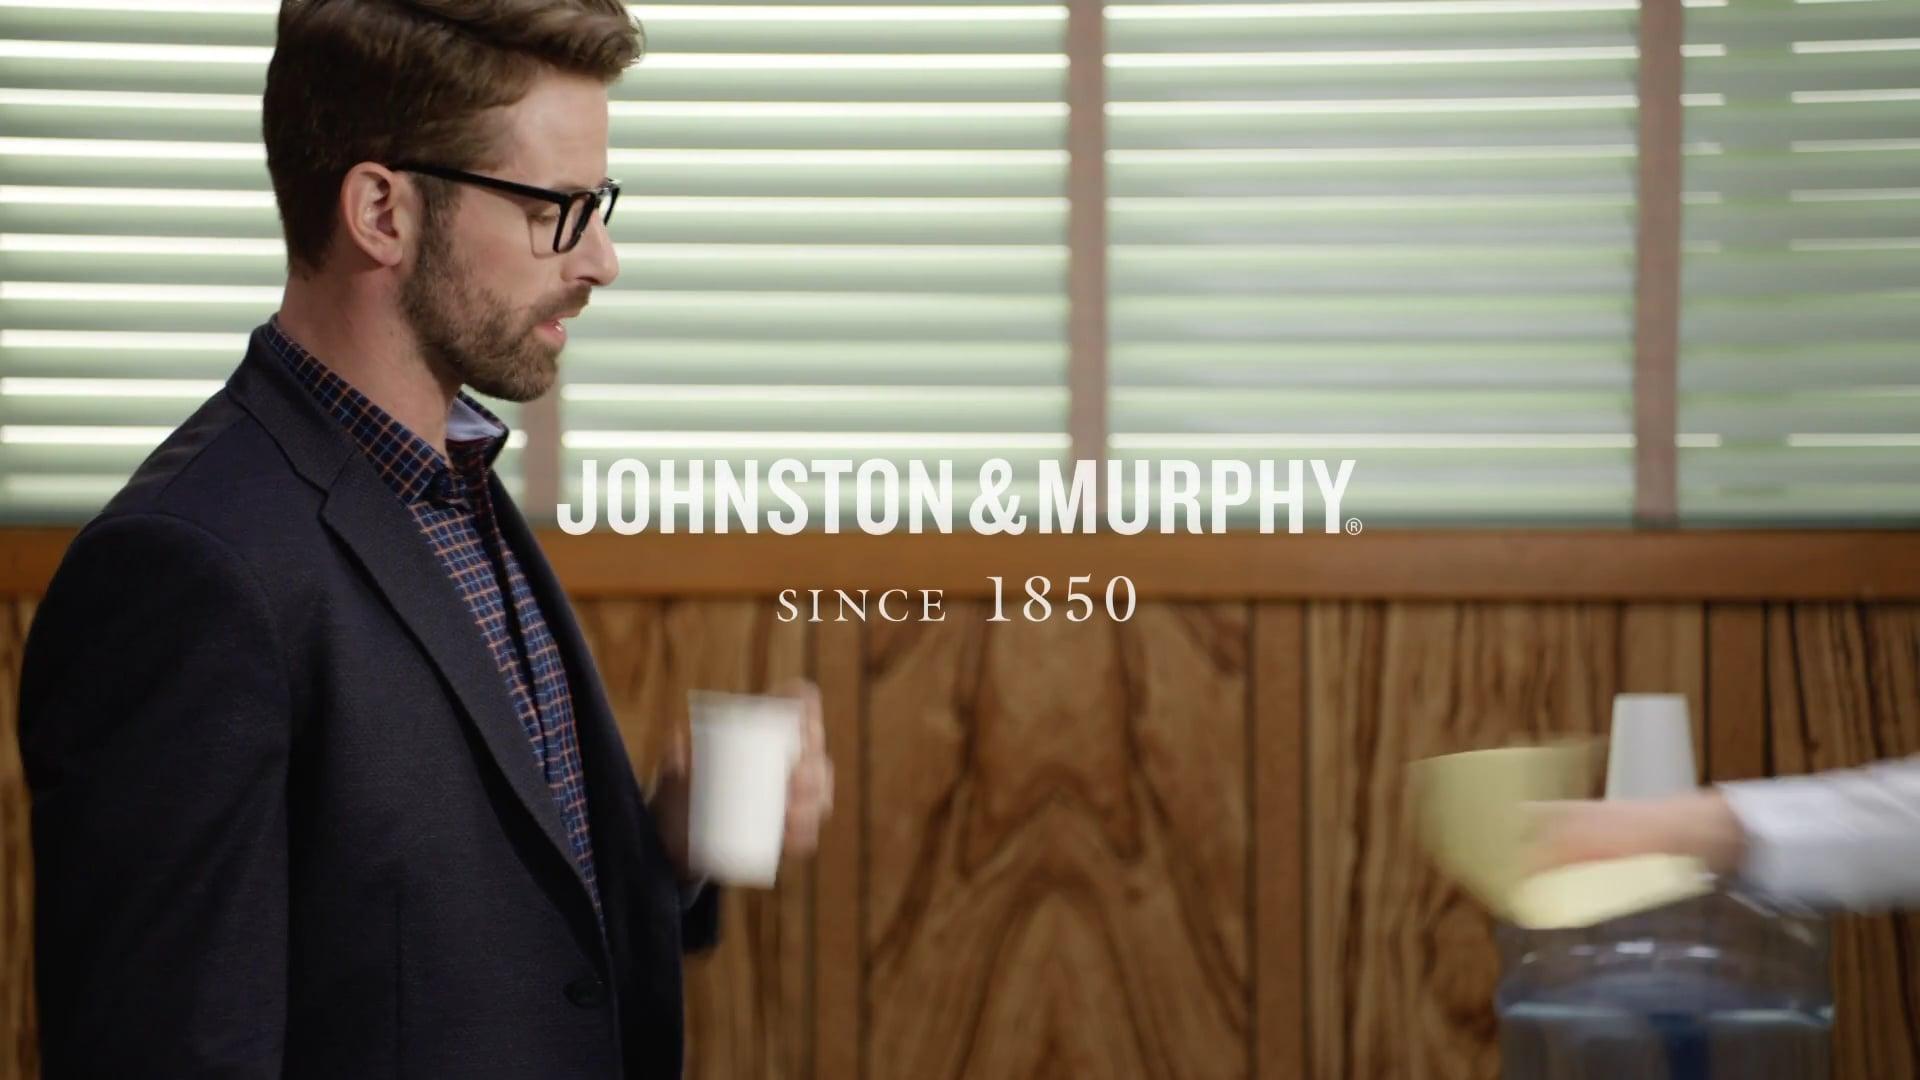 Johnston & Murphy - Performance Review